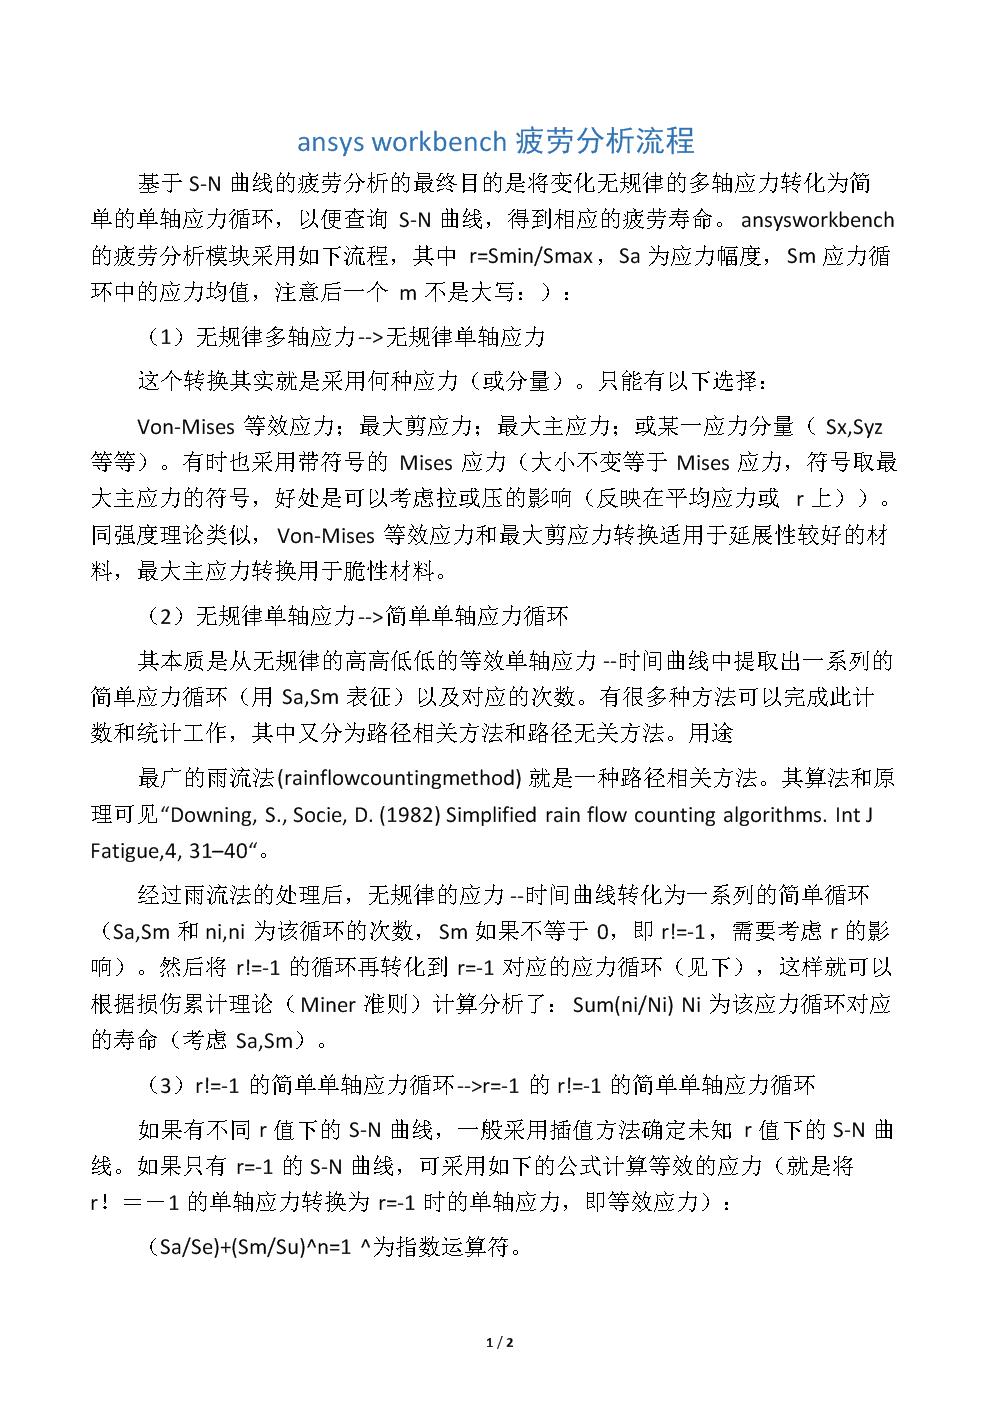 ansys-workbench疲劳分析流程.docx